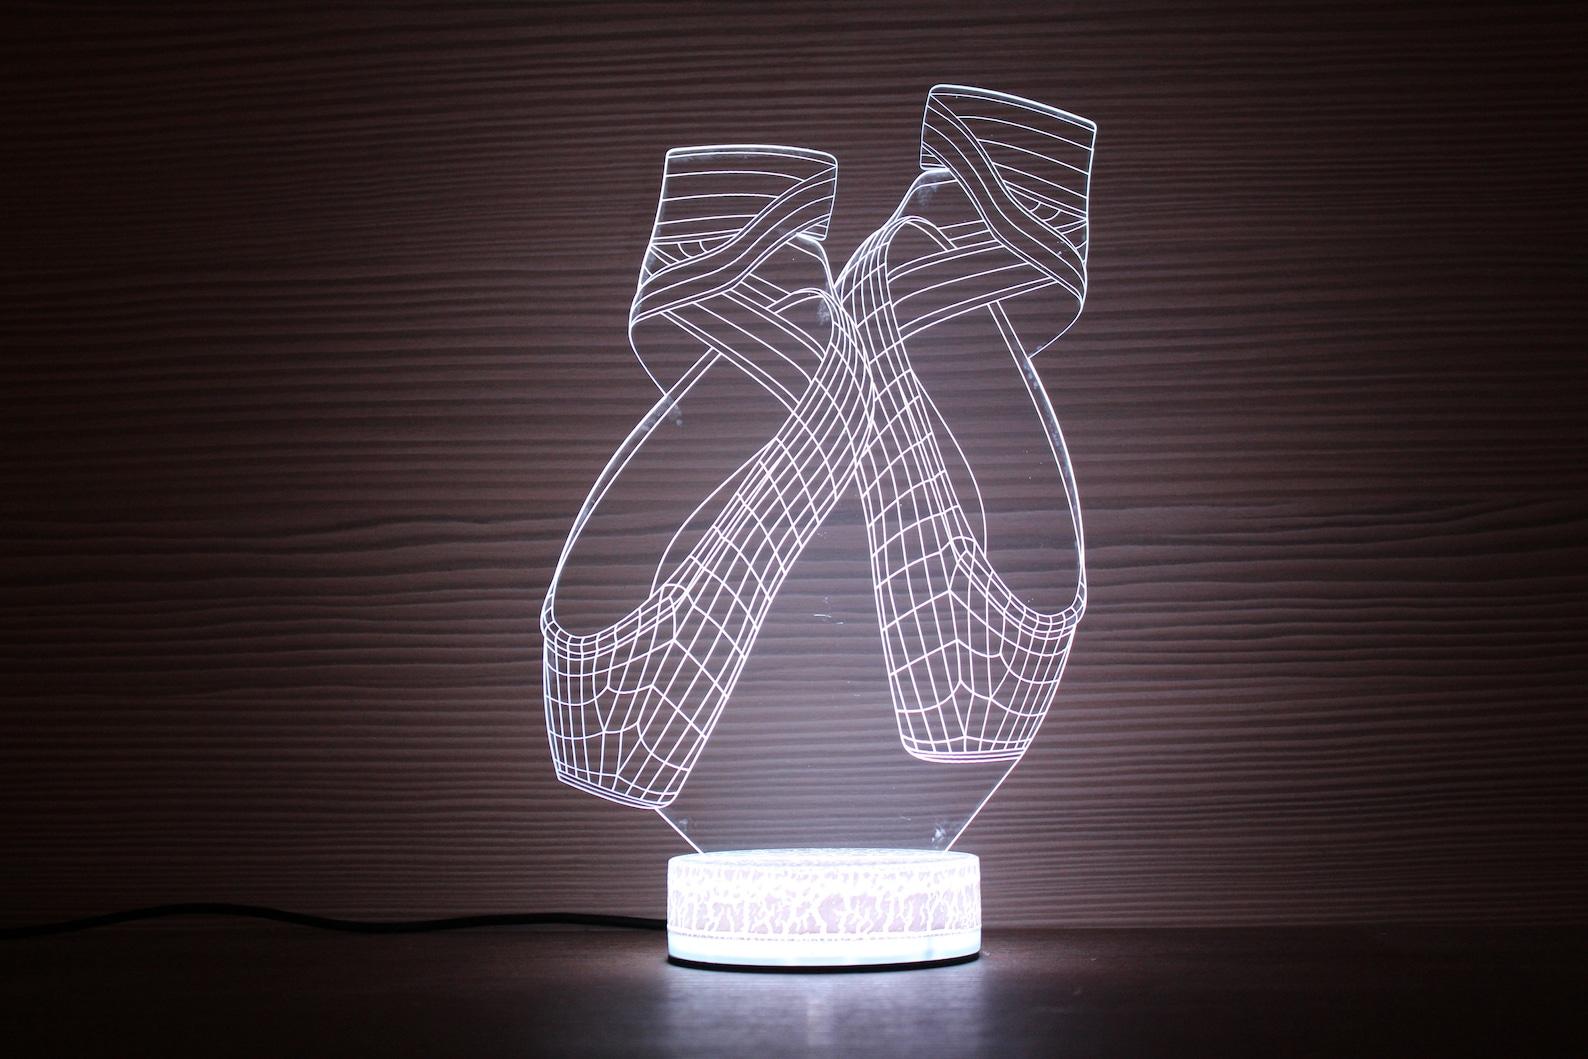 ballet shoes 3d night lamp night light children light 3d illusion led lamp ballerina birthday party gift idea kids birthday ball